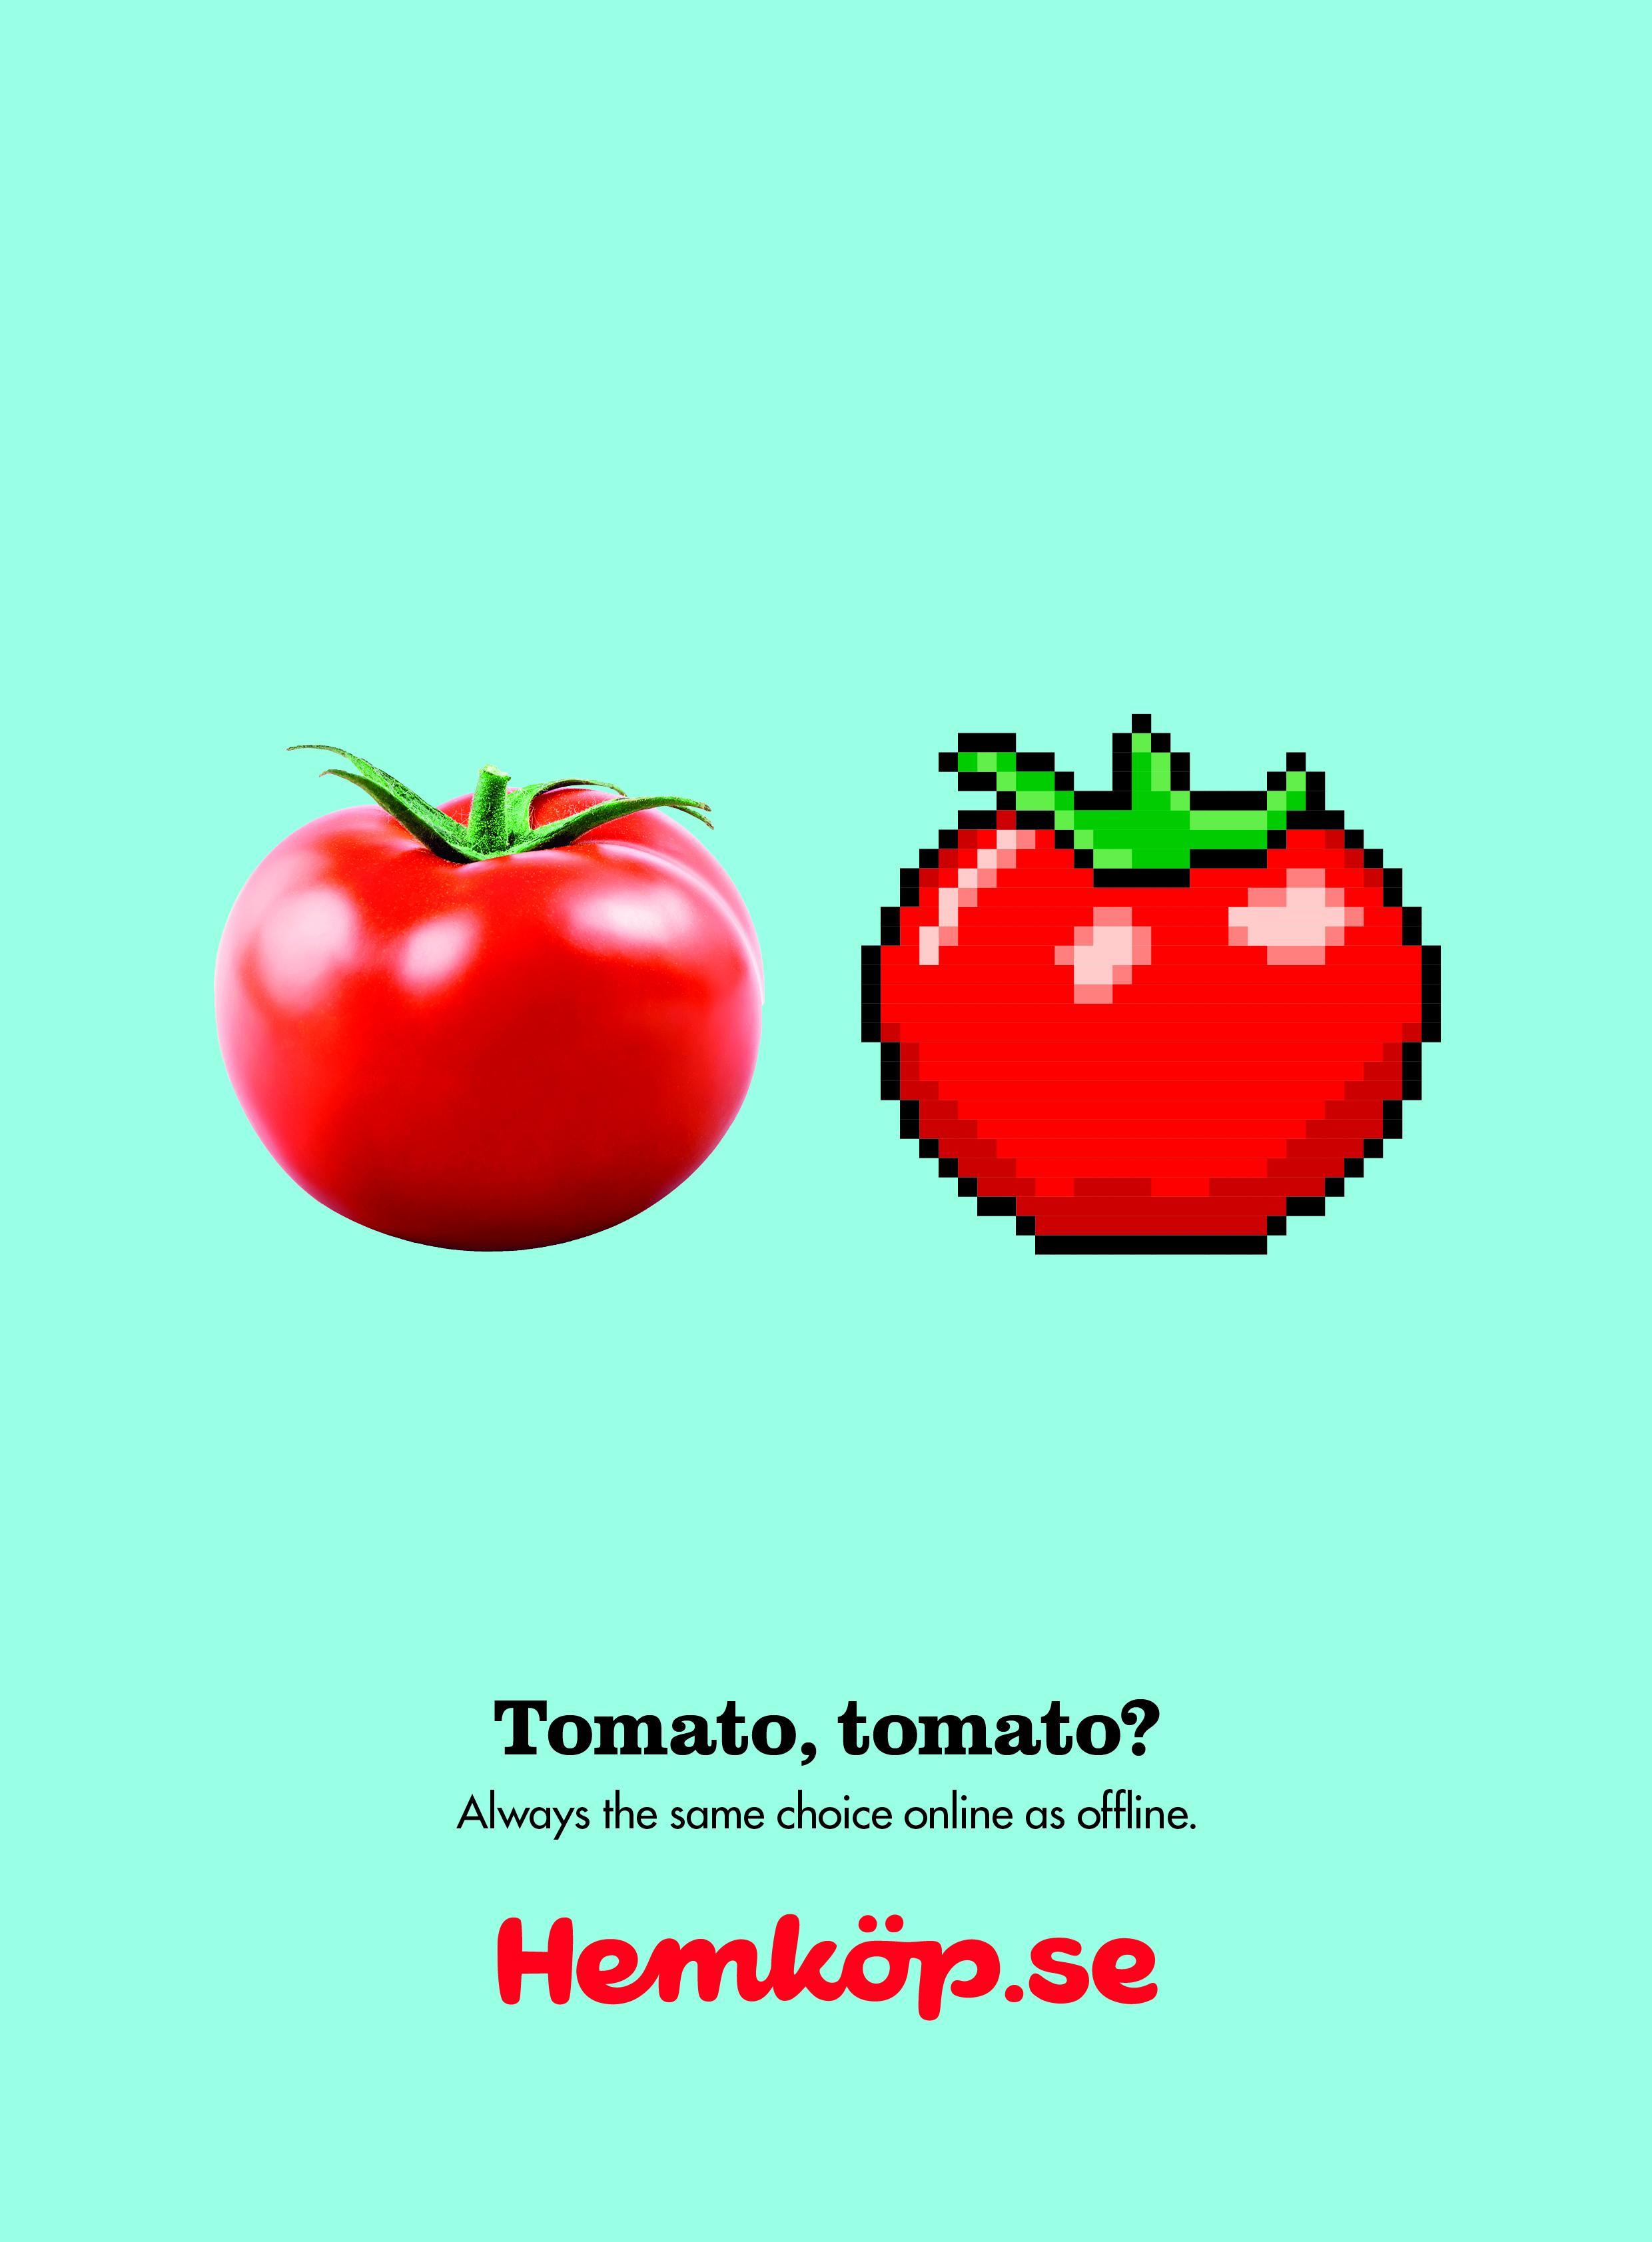 Hemköp Print Ad - Tomato